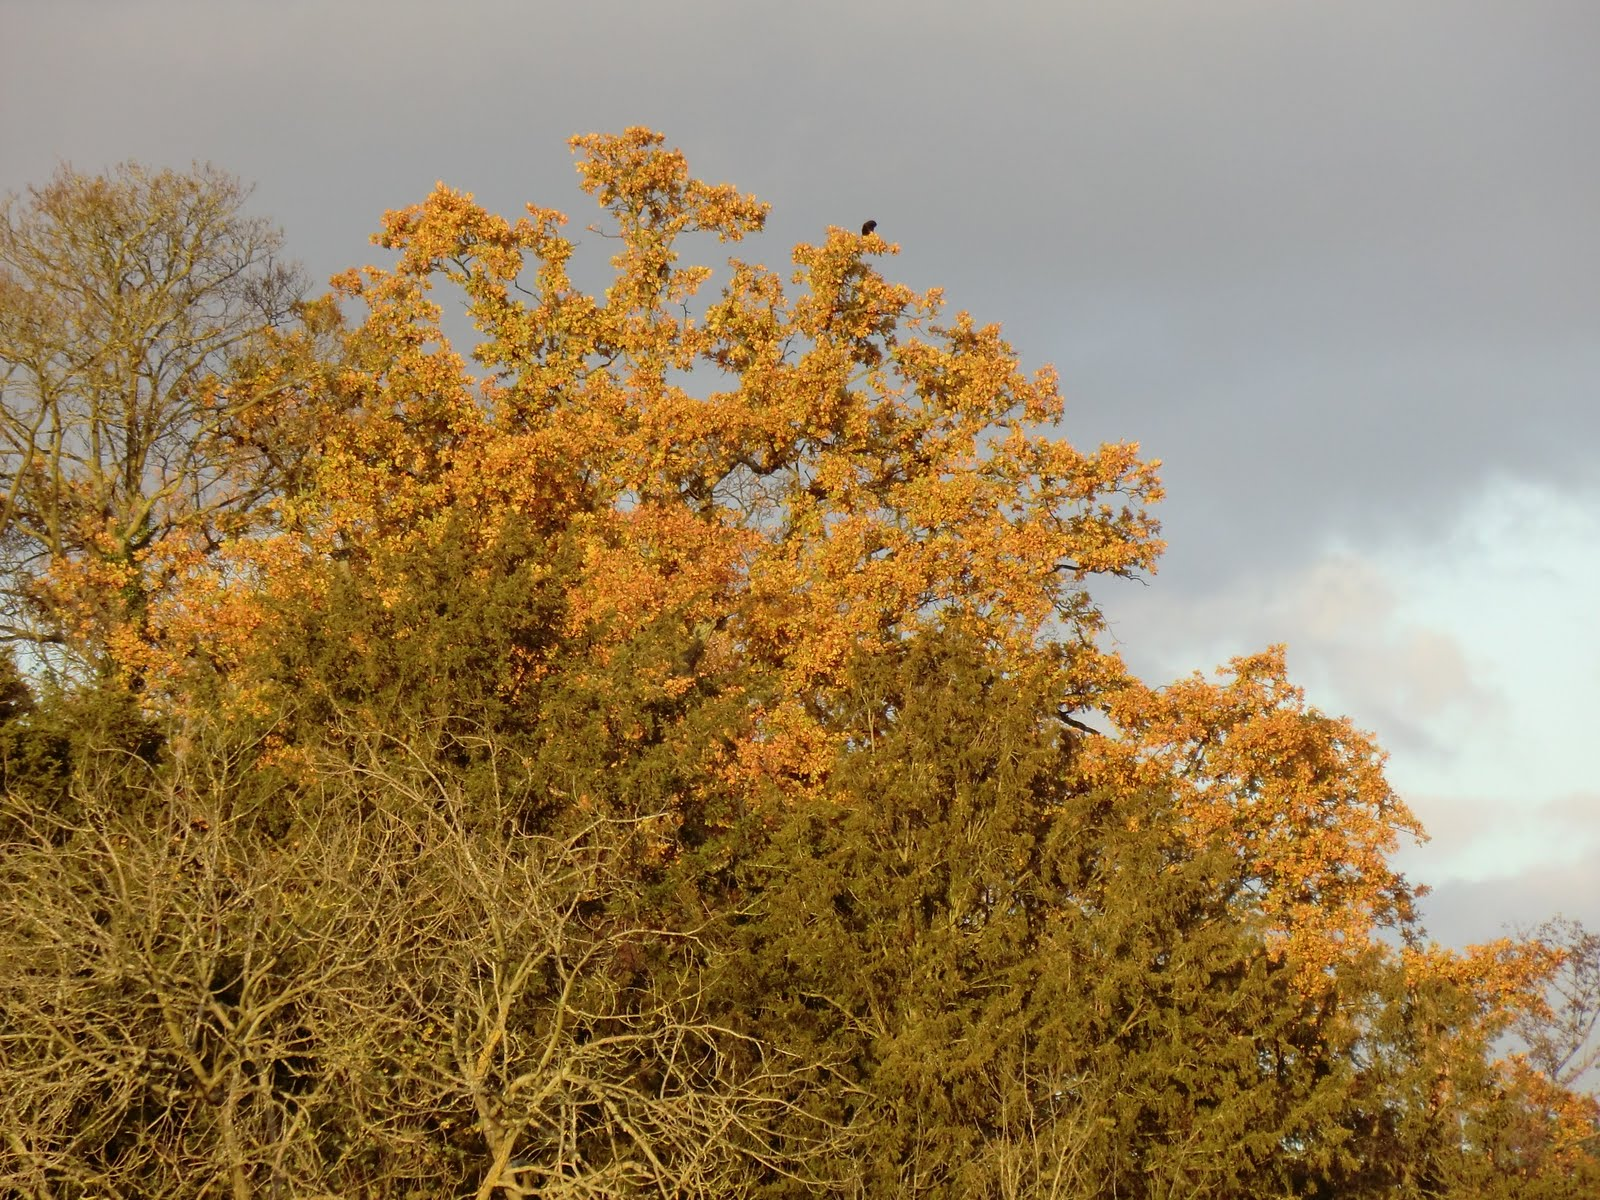 CIMG0850 Autumn colours by the River Mole